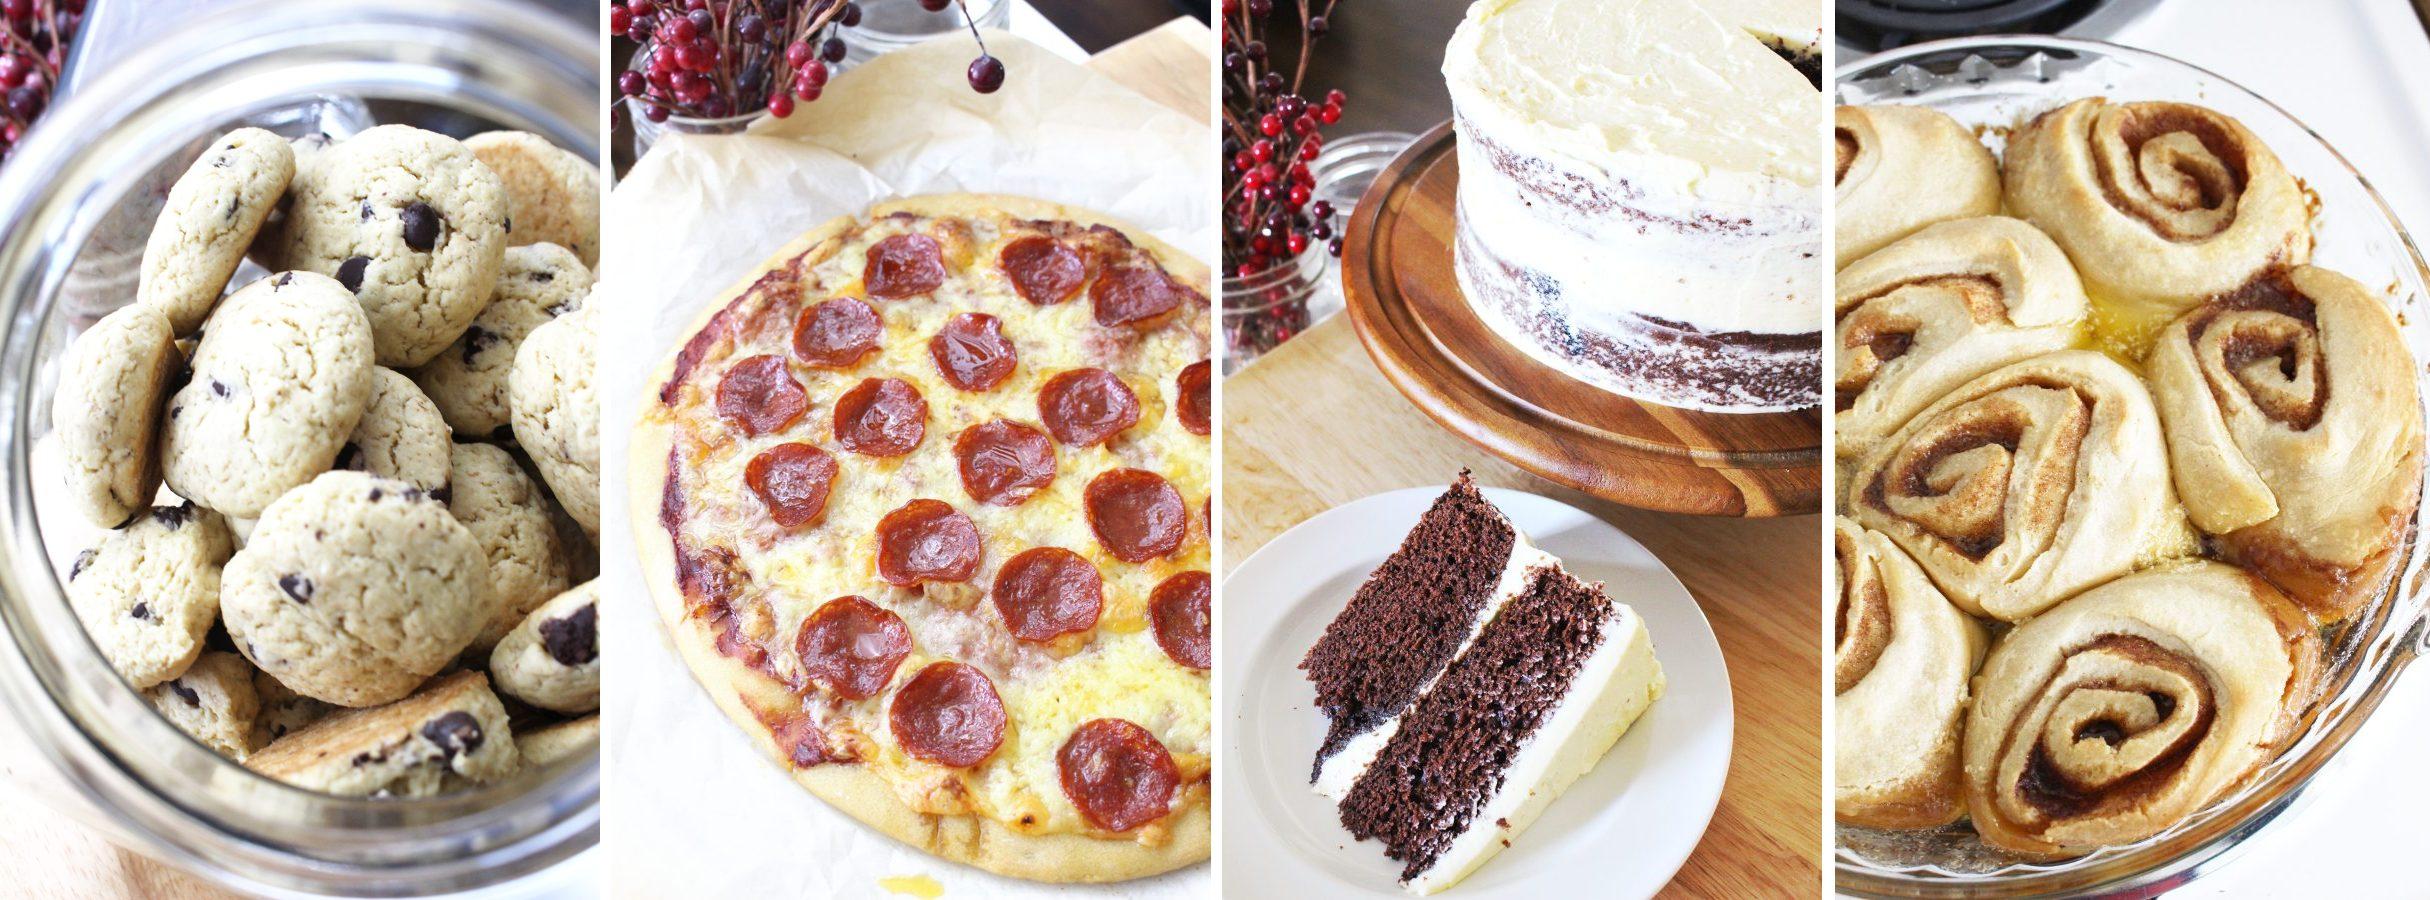 sourdough recipes taught in the course